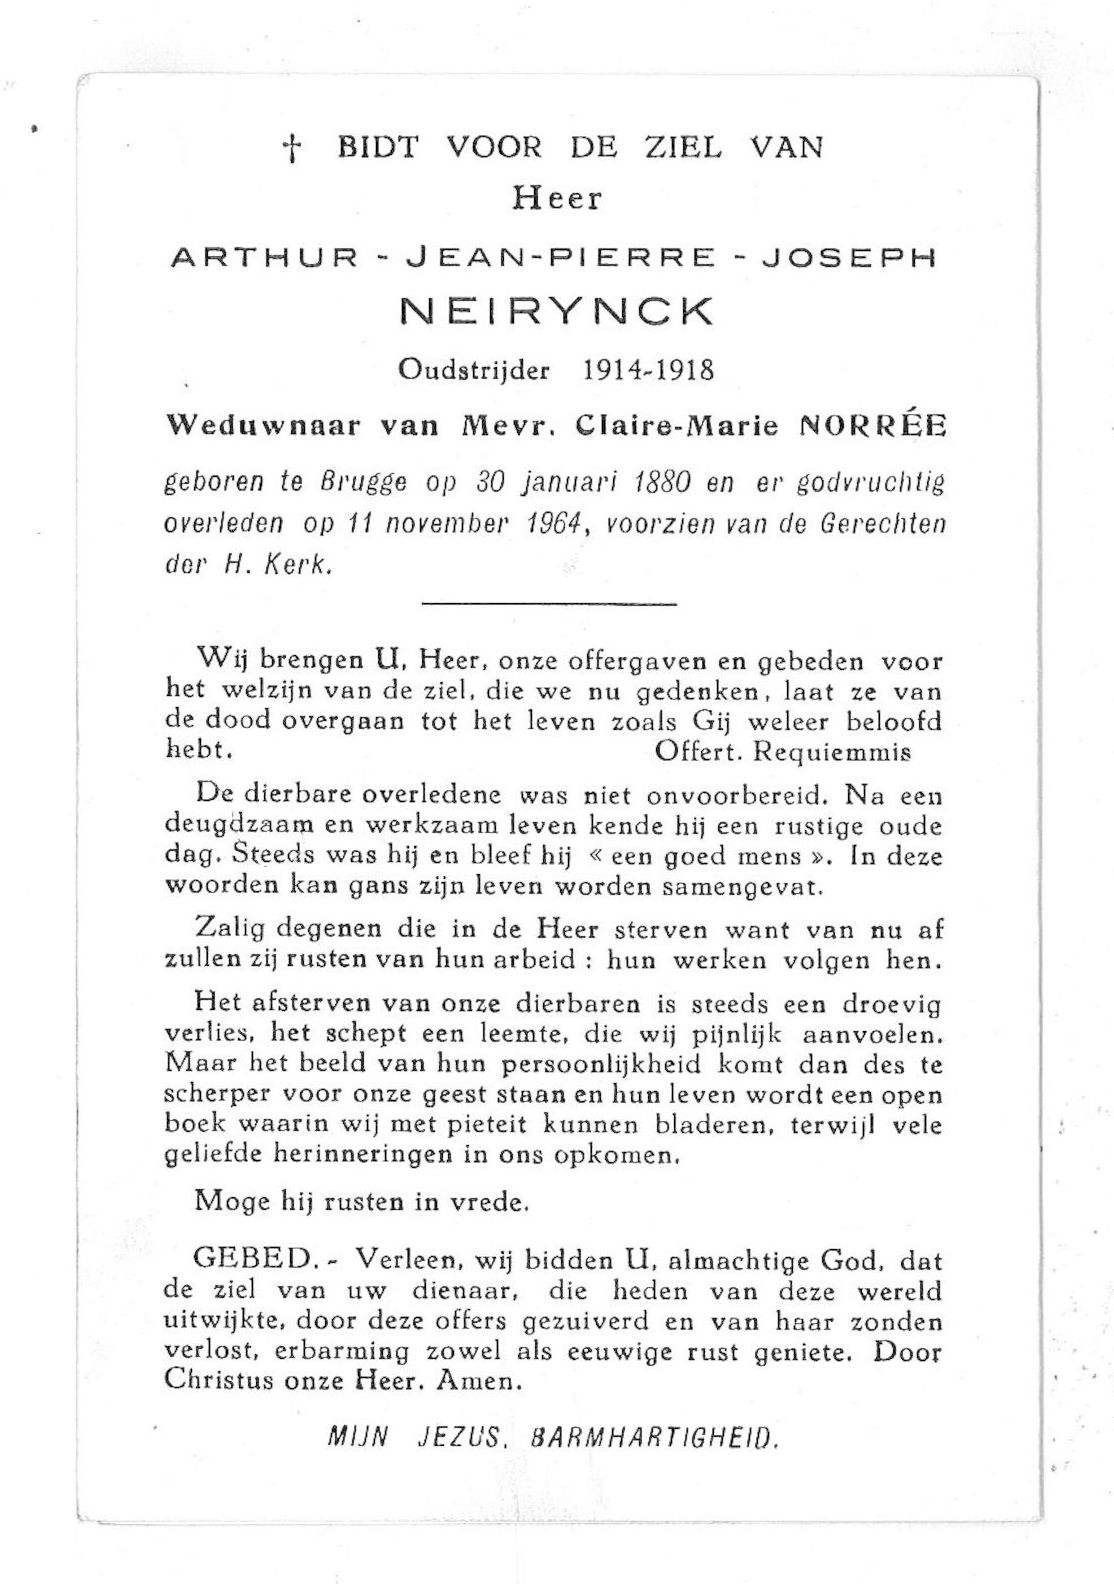 Arthur-Jean-Pierre-Joseph Neirynck